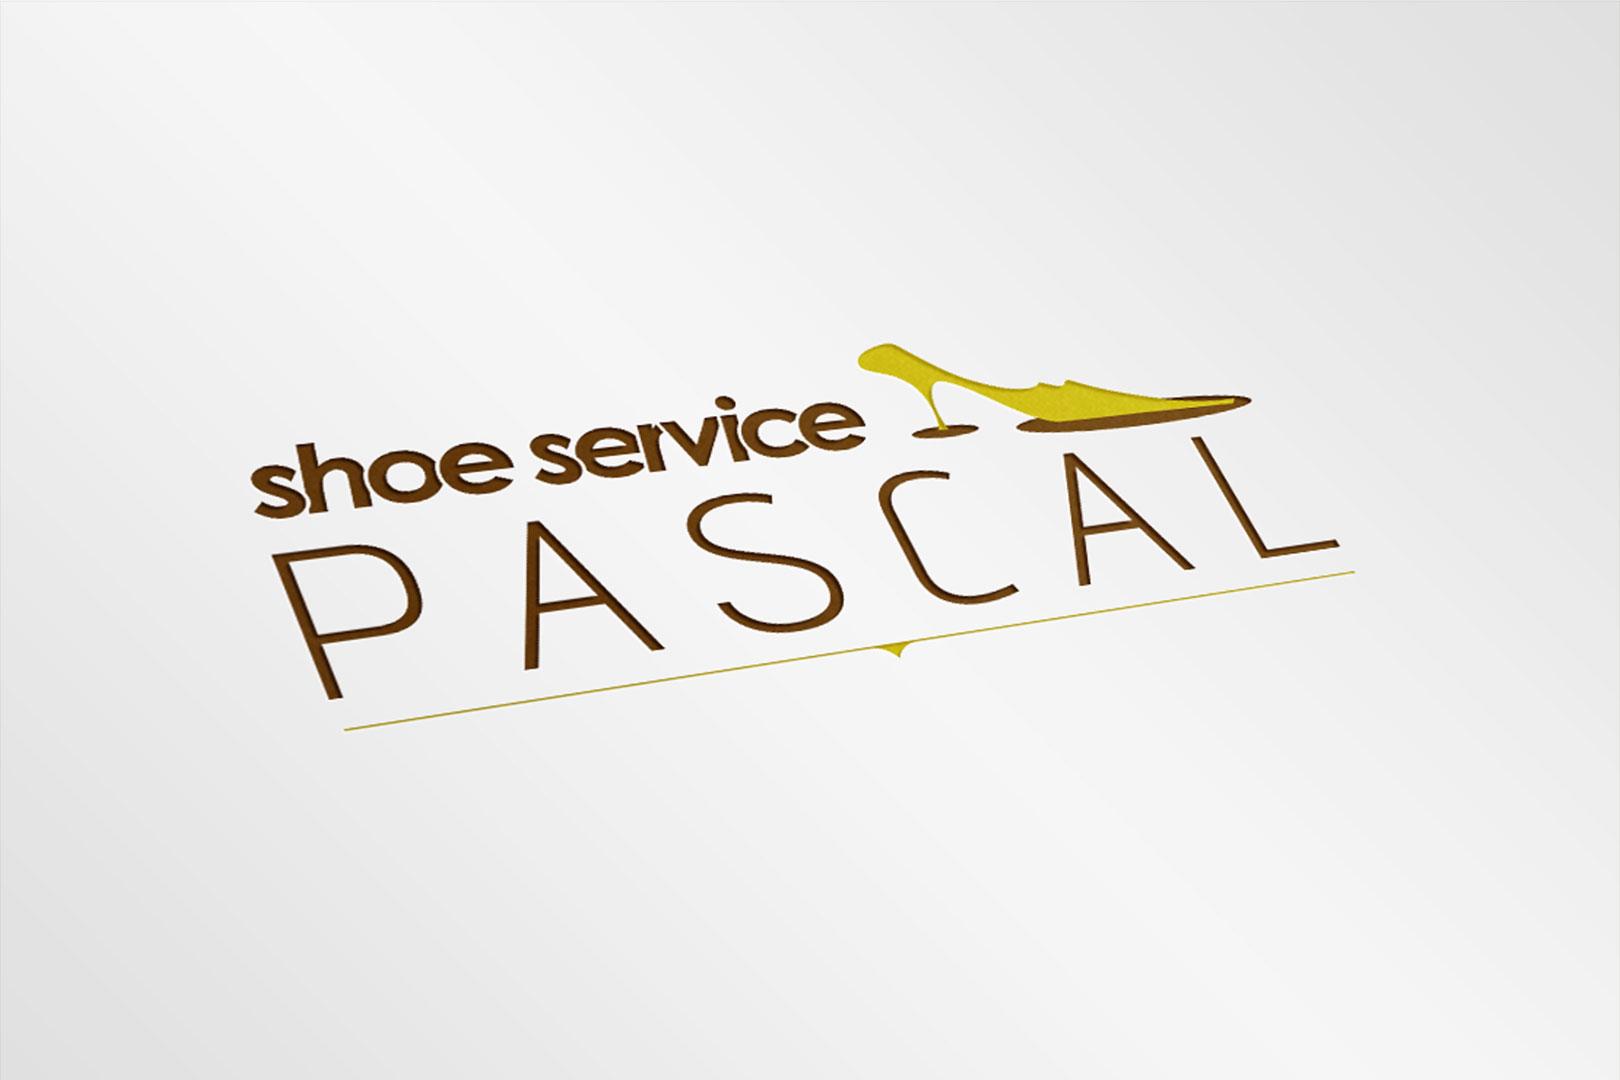 pascal1